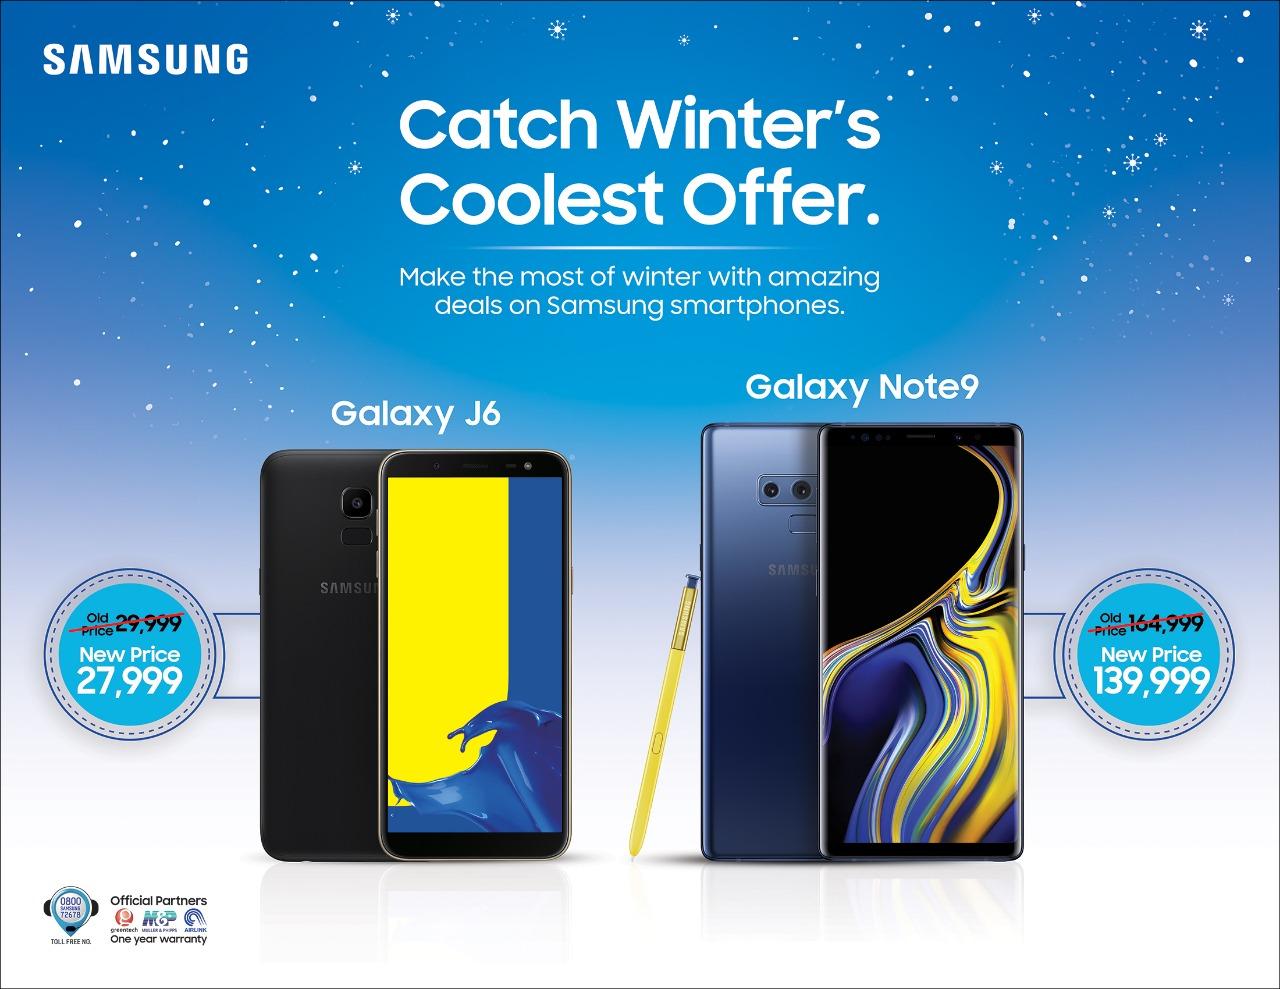 Don't Miss Samsung Galaxy Note 9 & Galaxy J6 Offer